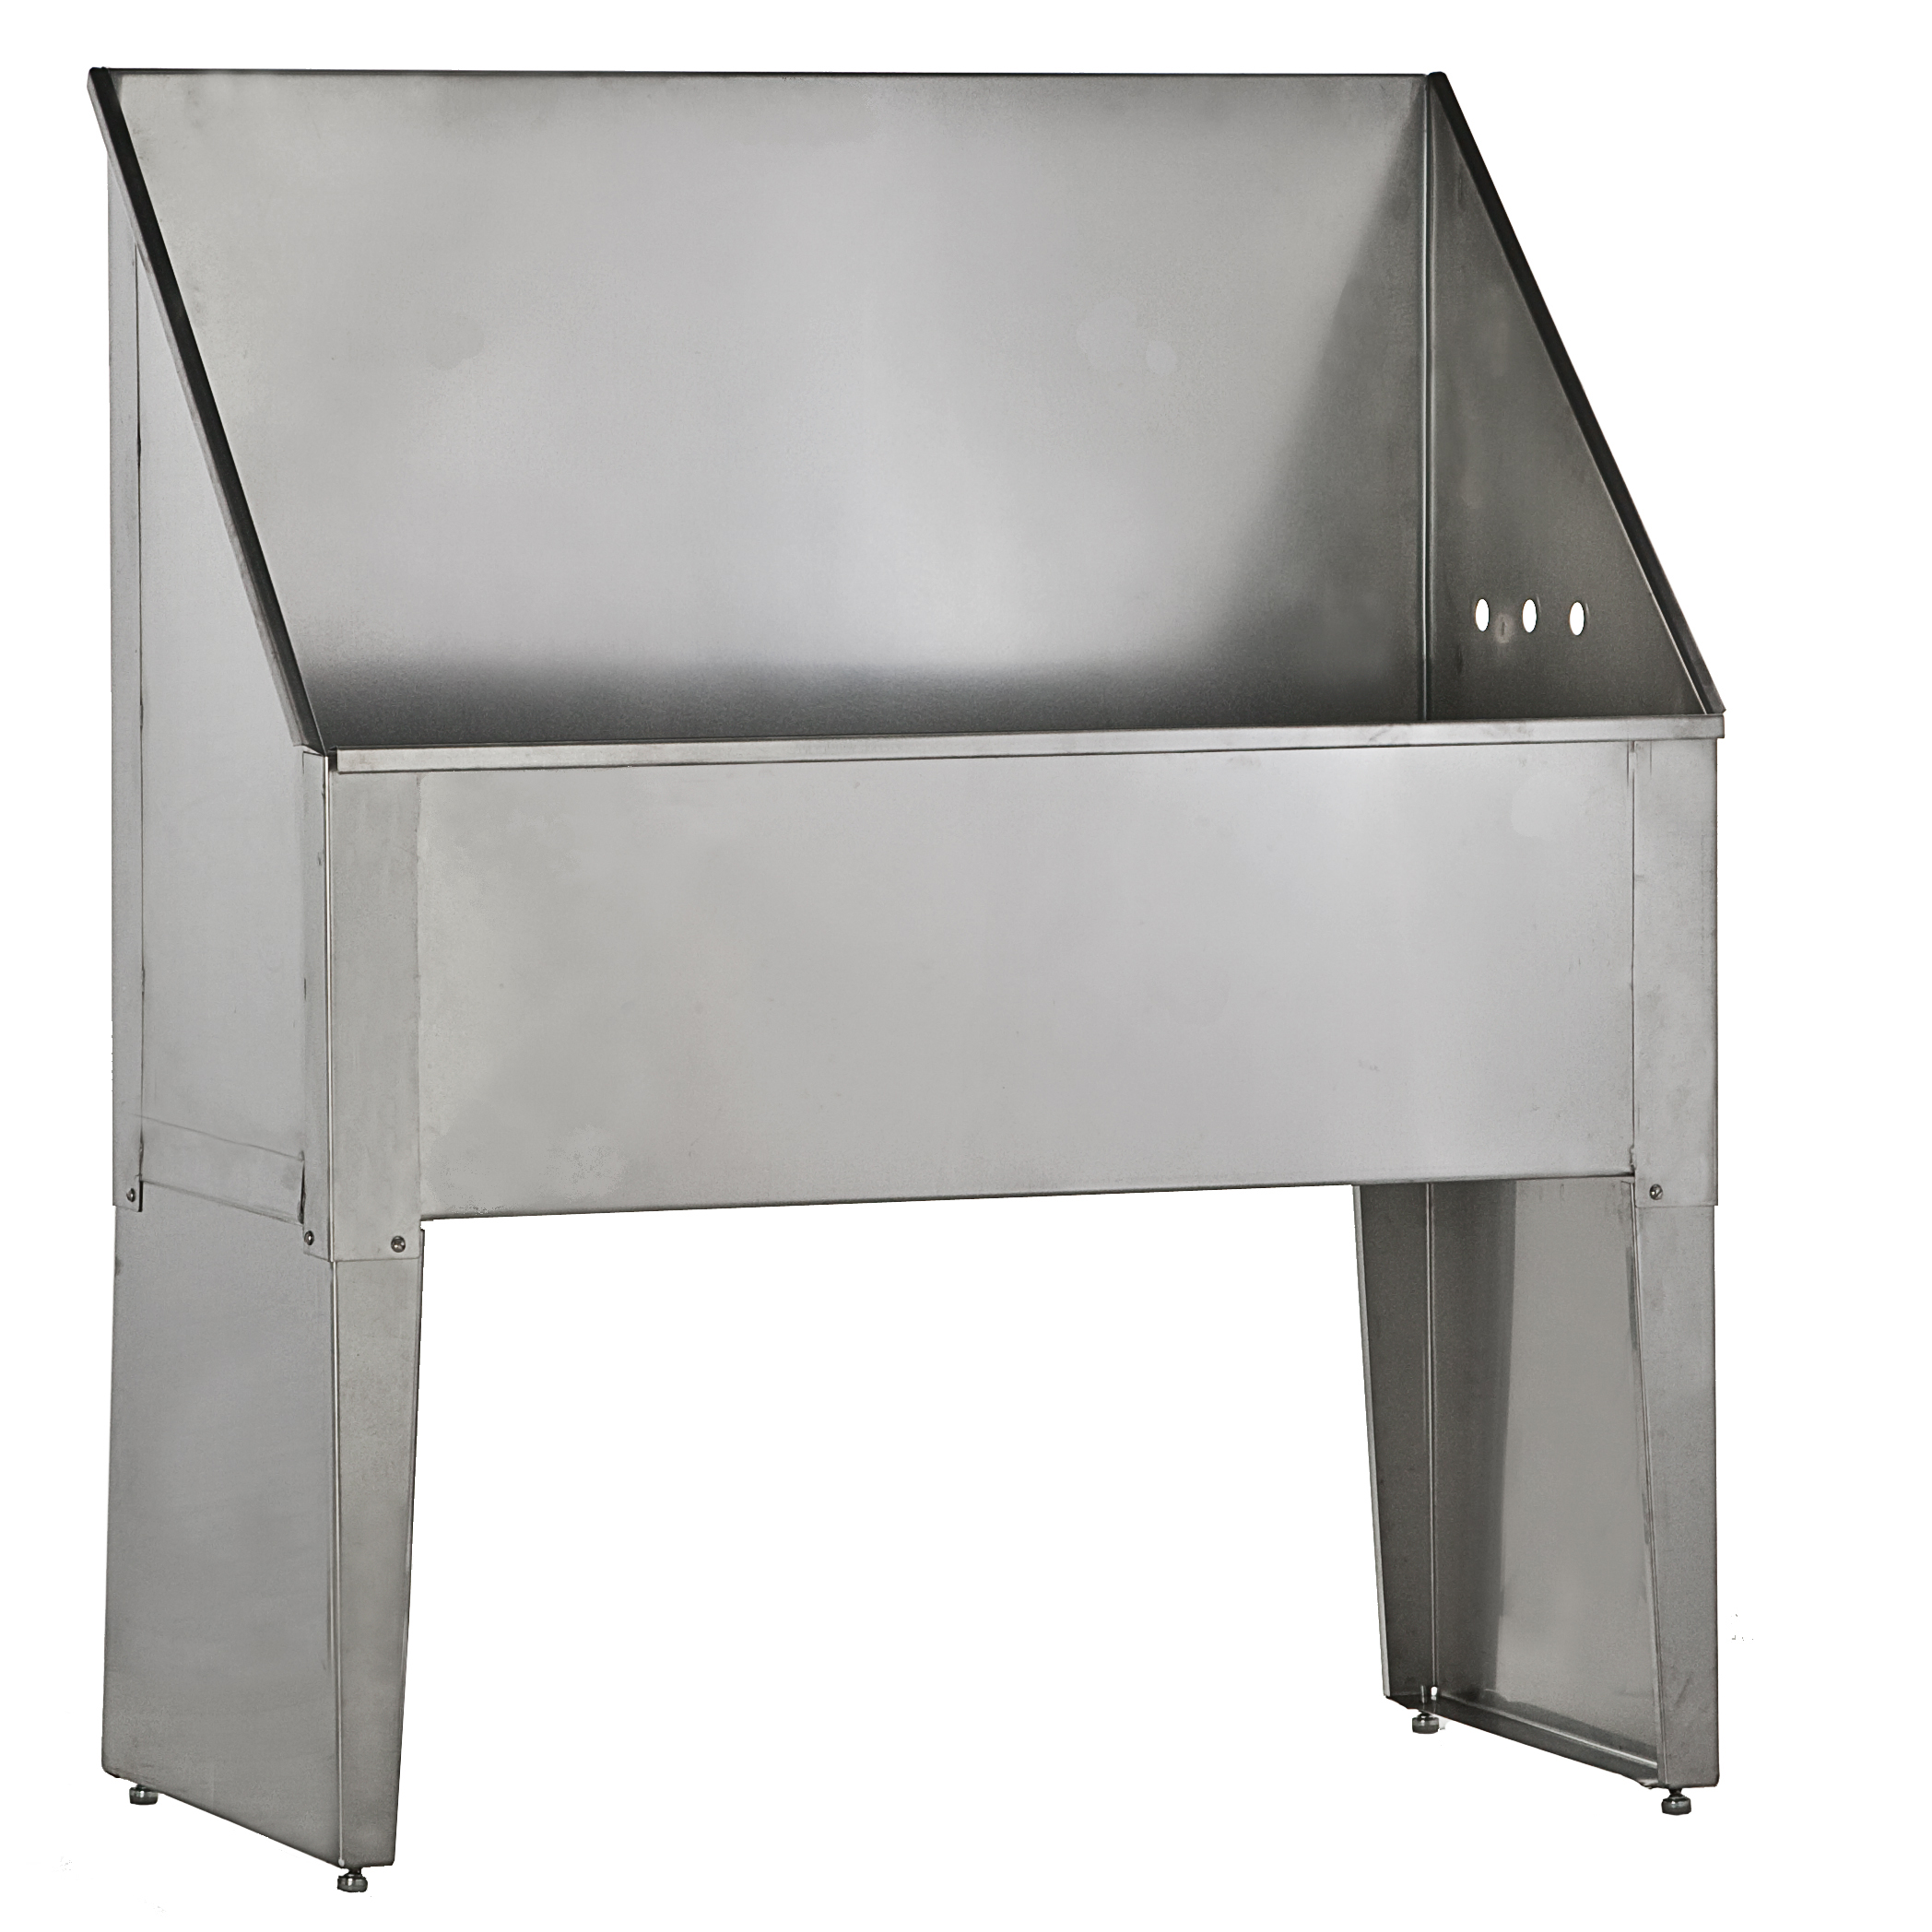 Best Utility Sink Stainless Steel Utility Sinks